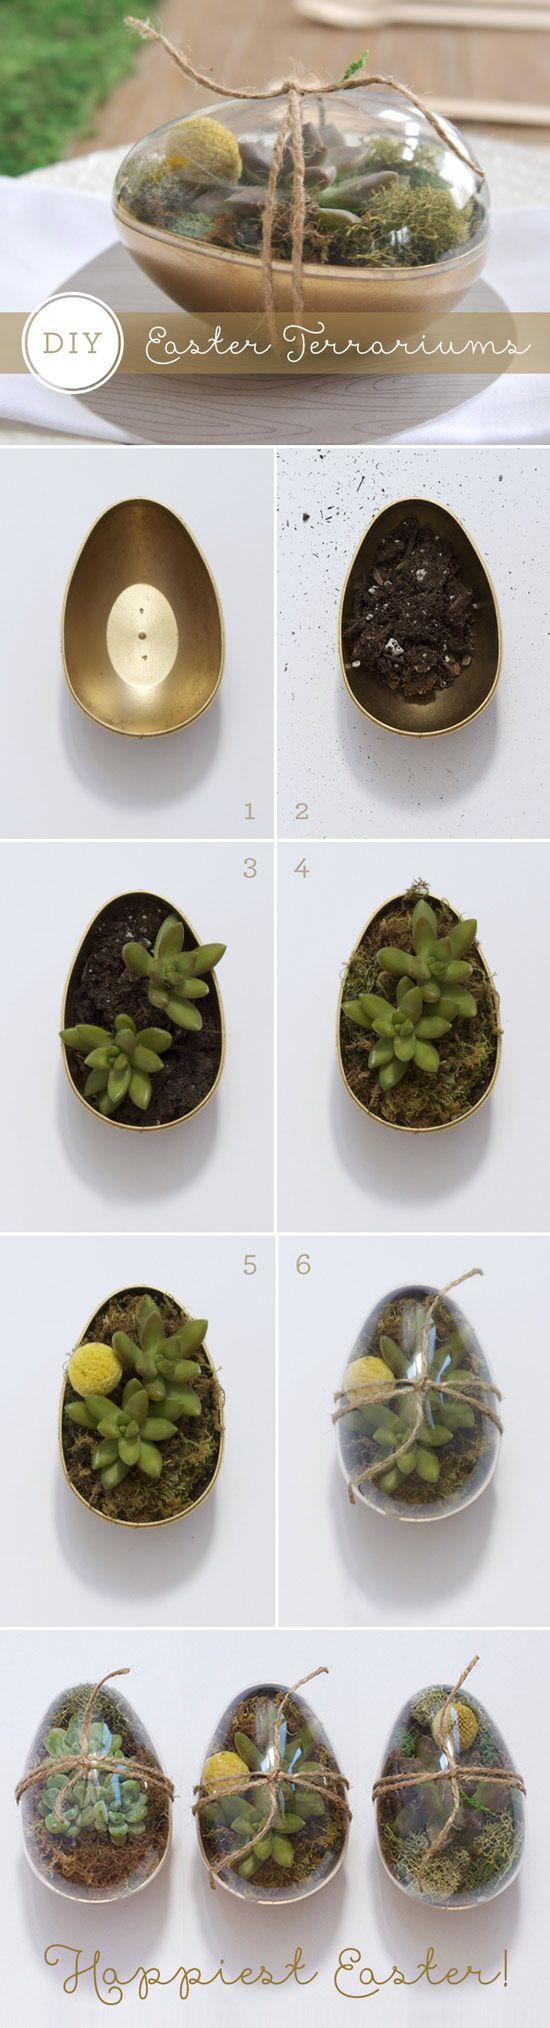 DIY Easter Egg Terrariums